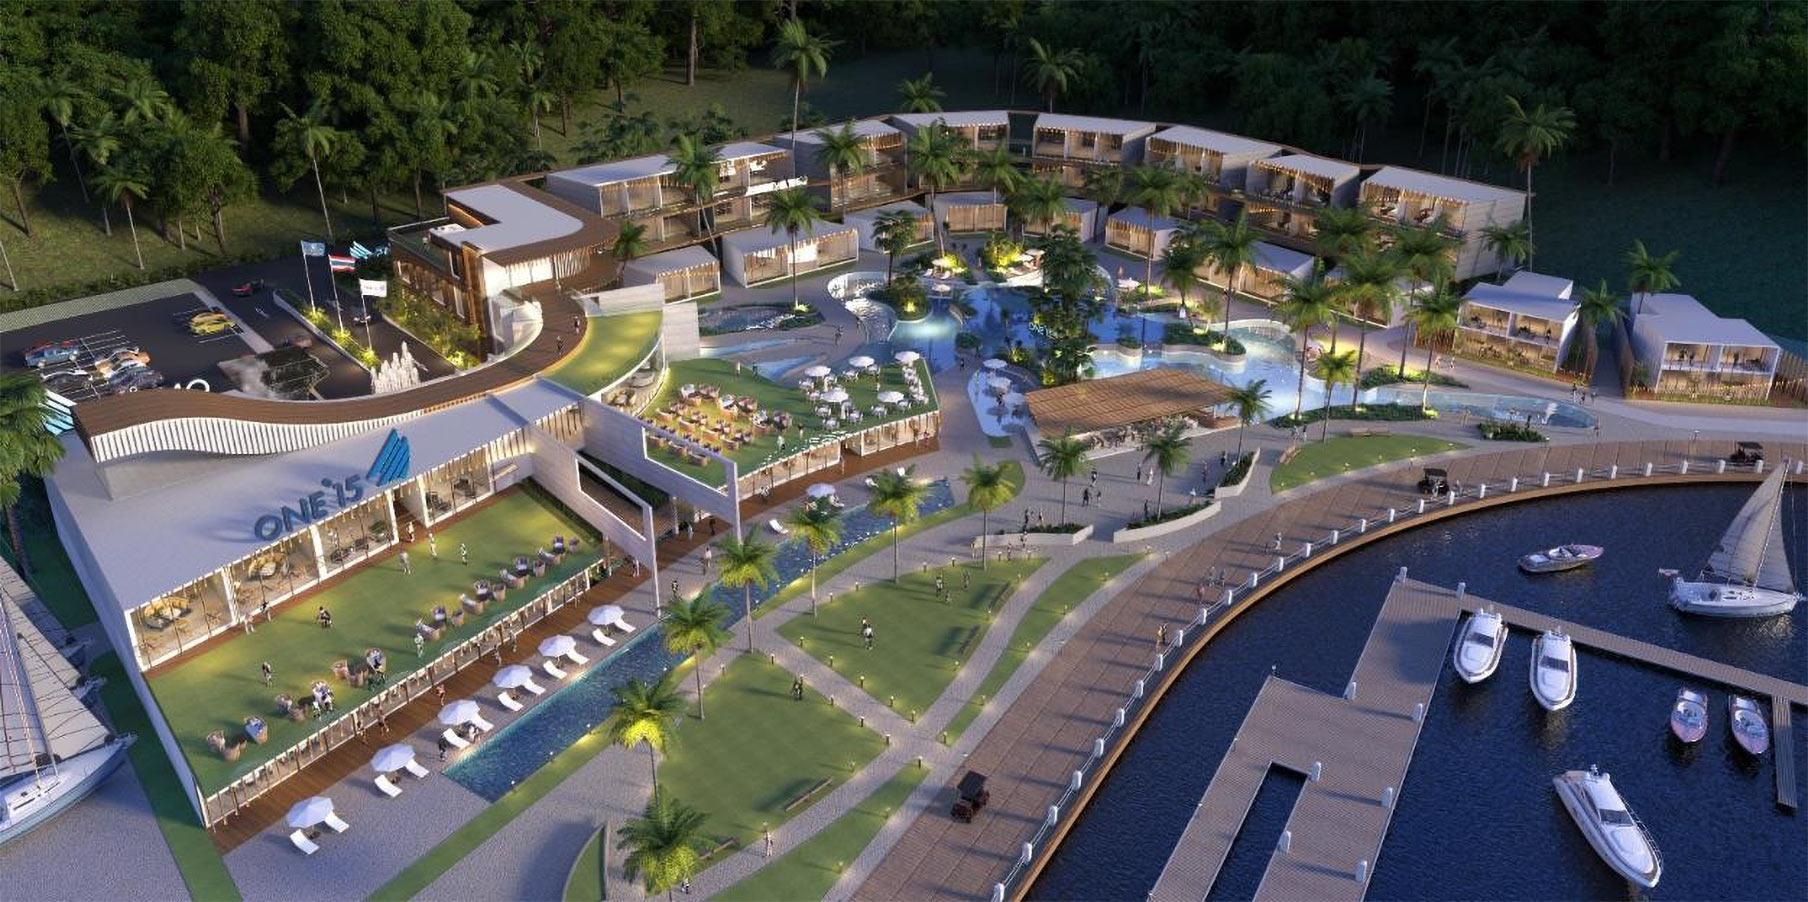 New Marina Announced for Phuket